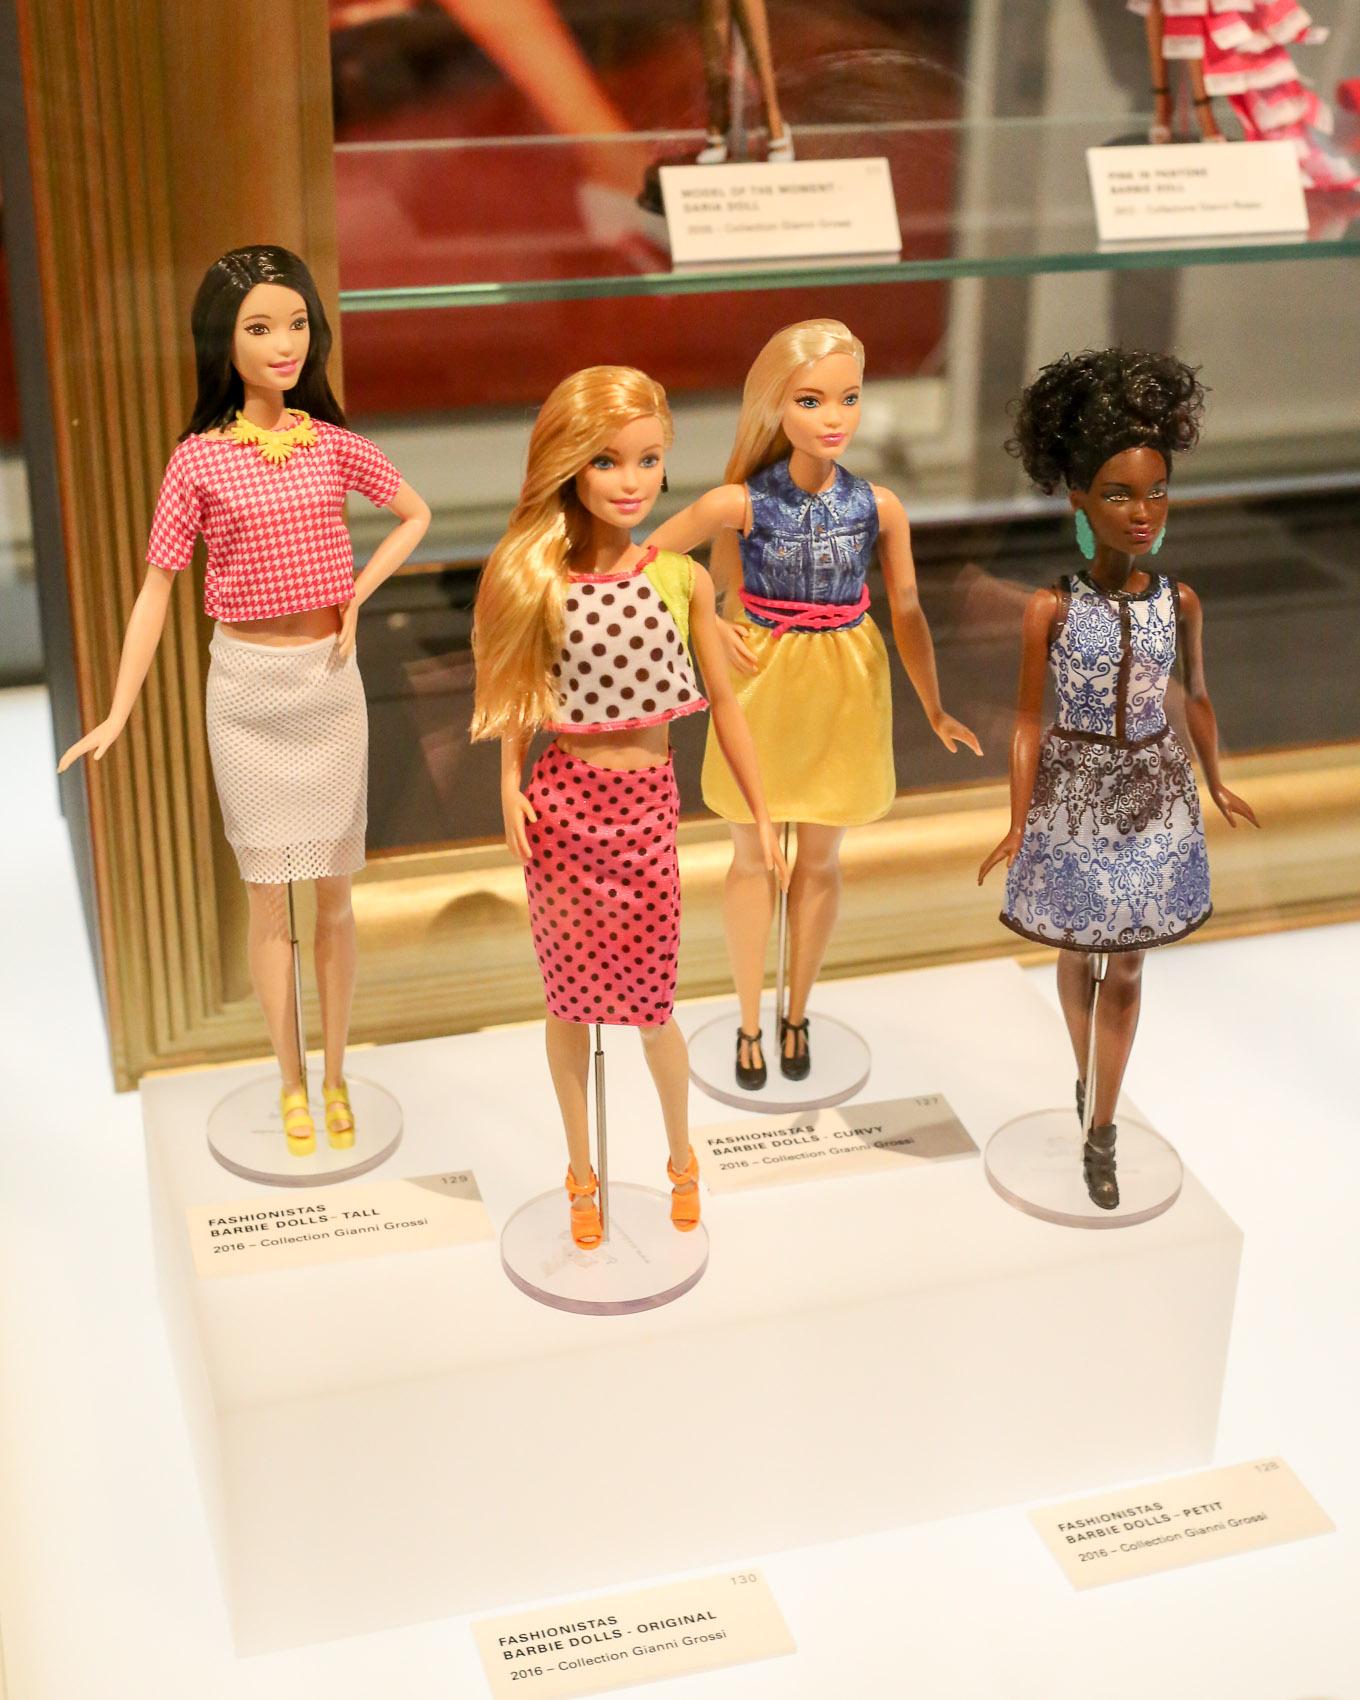 Kansallismuseo - Barbie-näyttely-5.jpg